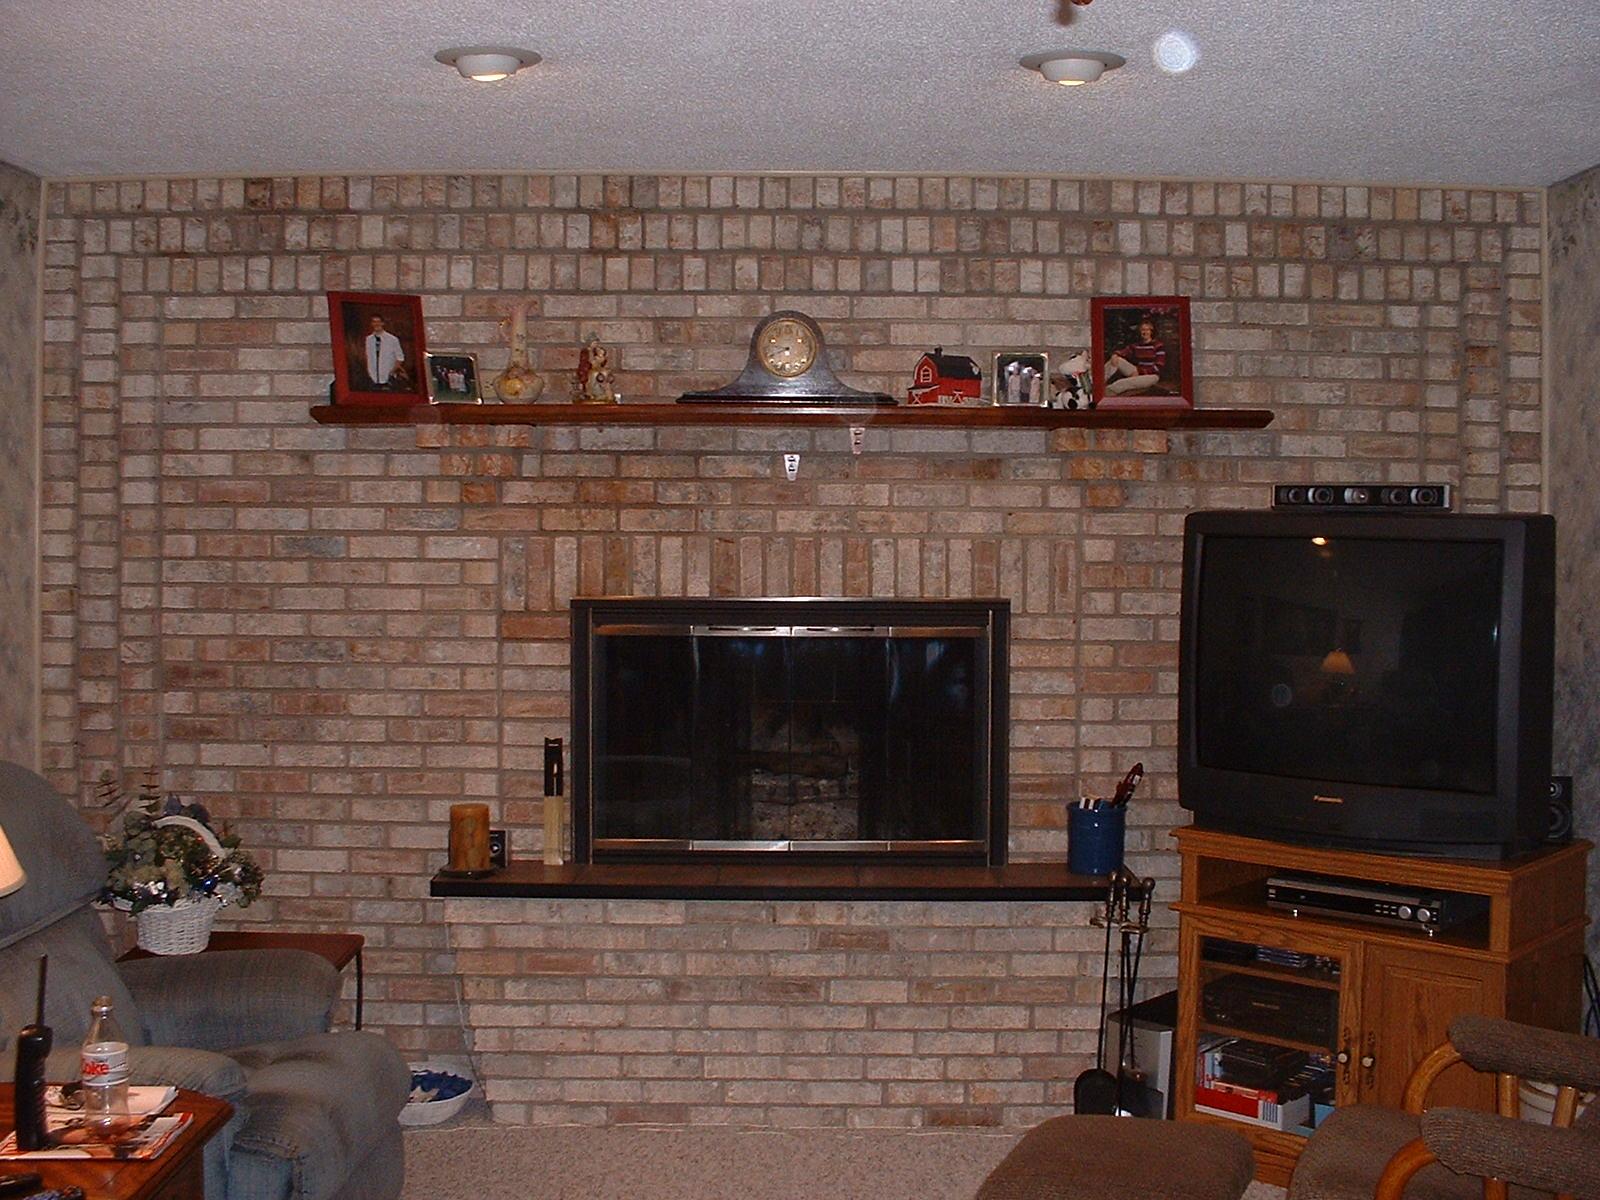 Brick Laminate Picture: Brick Fireplace